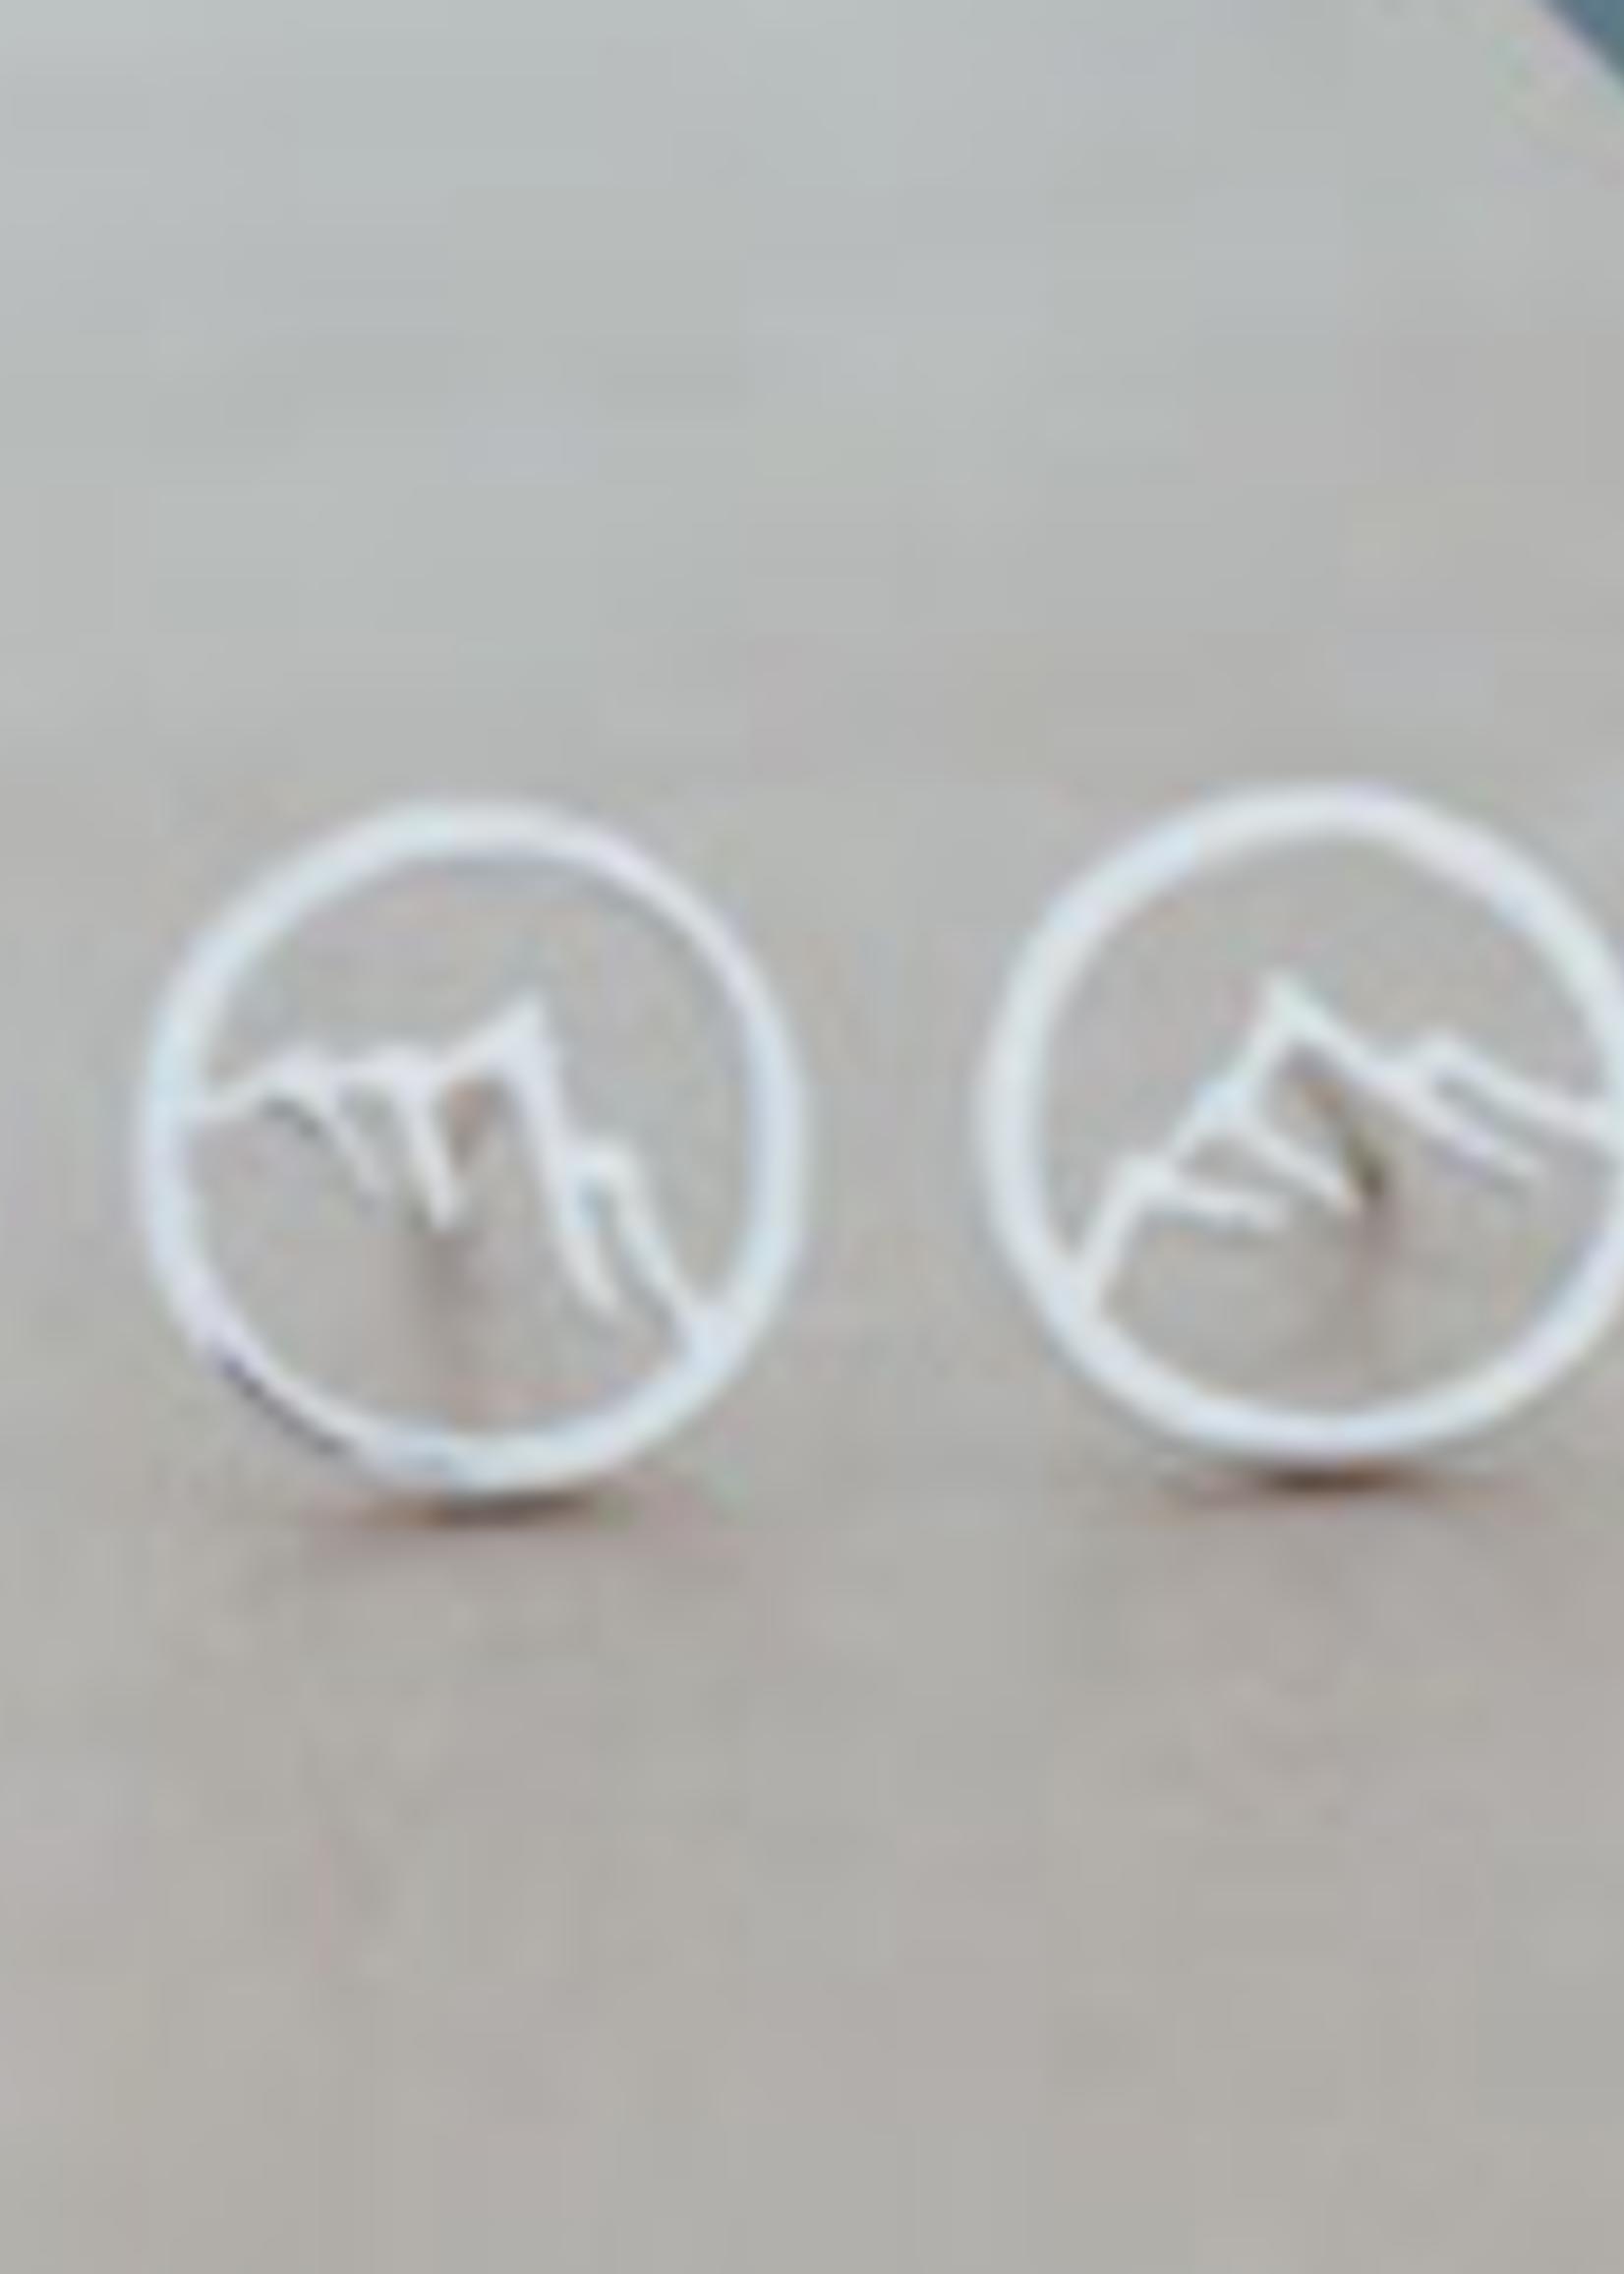 Glee Jewelry Snowcap Stud- Silver